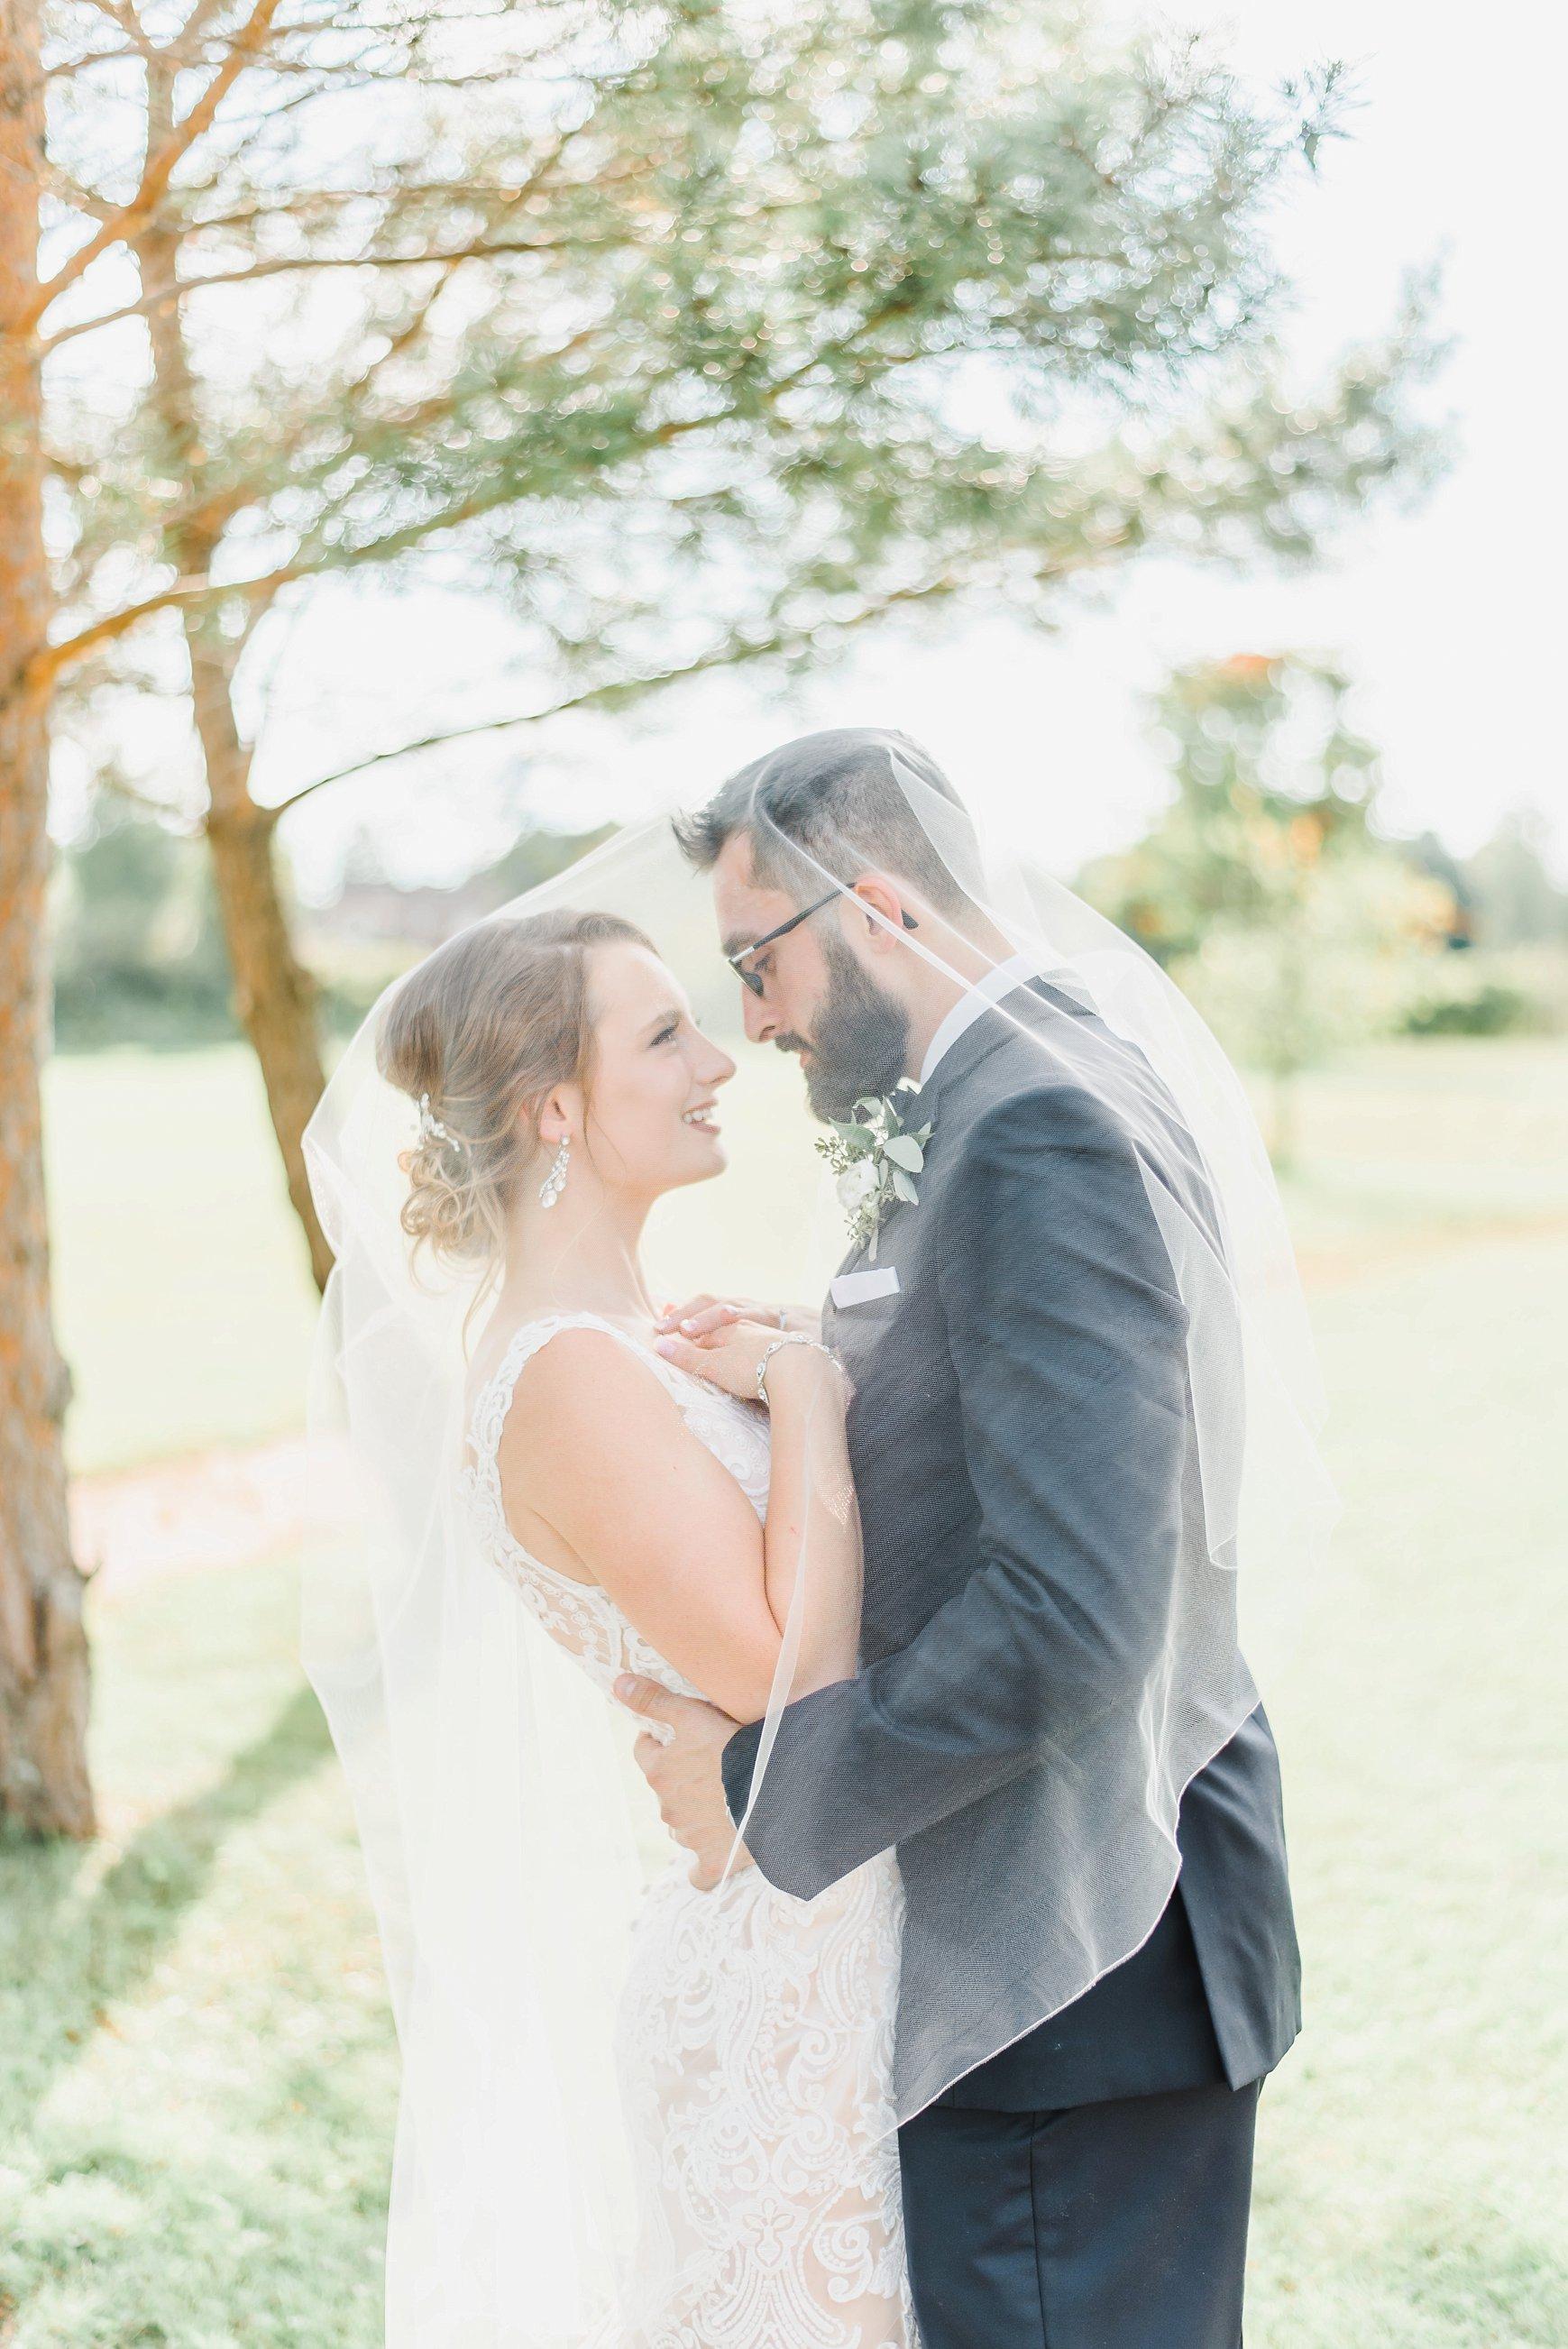 light airy indie fine art ottawa wedding photographer | Ali and Batoul Photography_1313.jpg